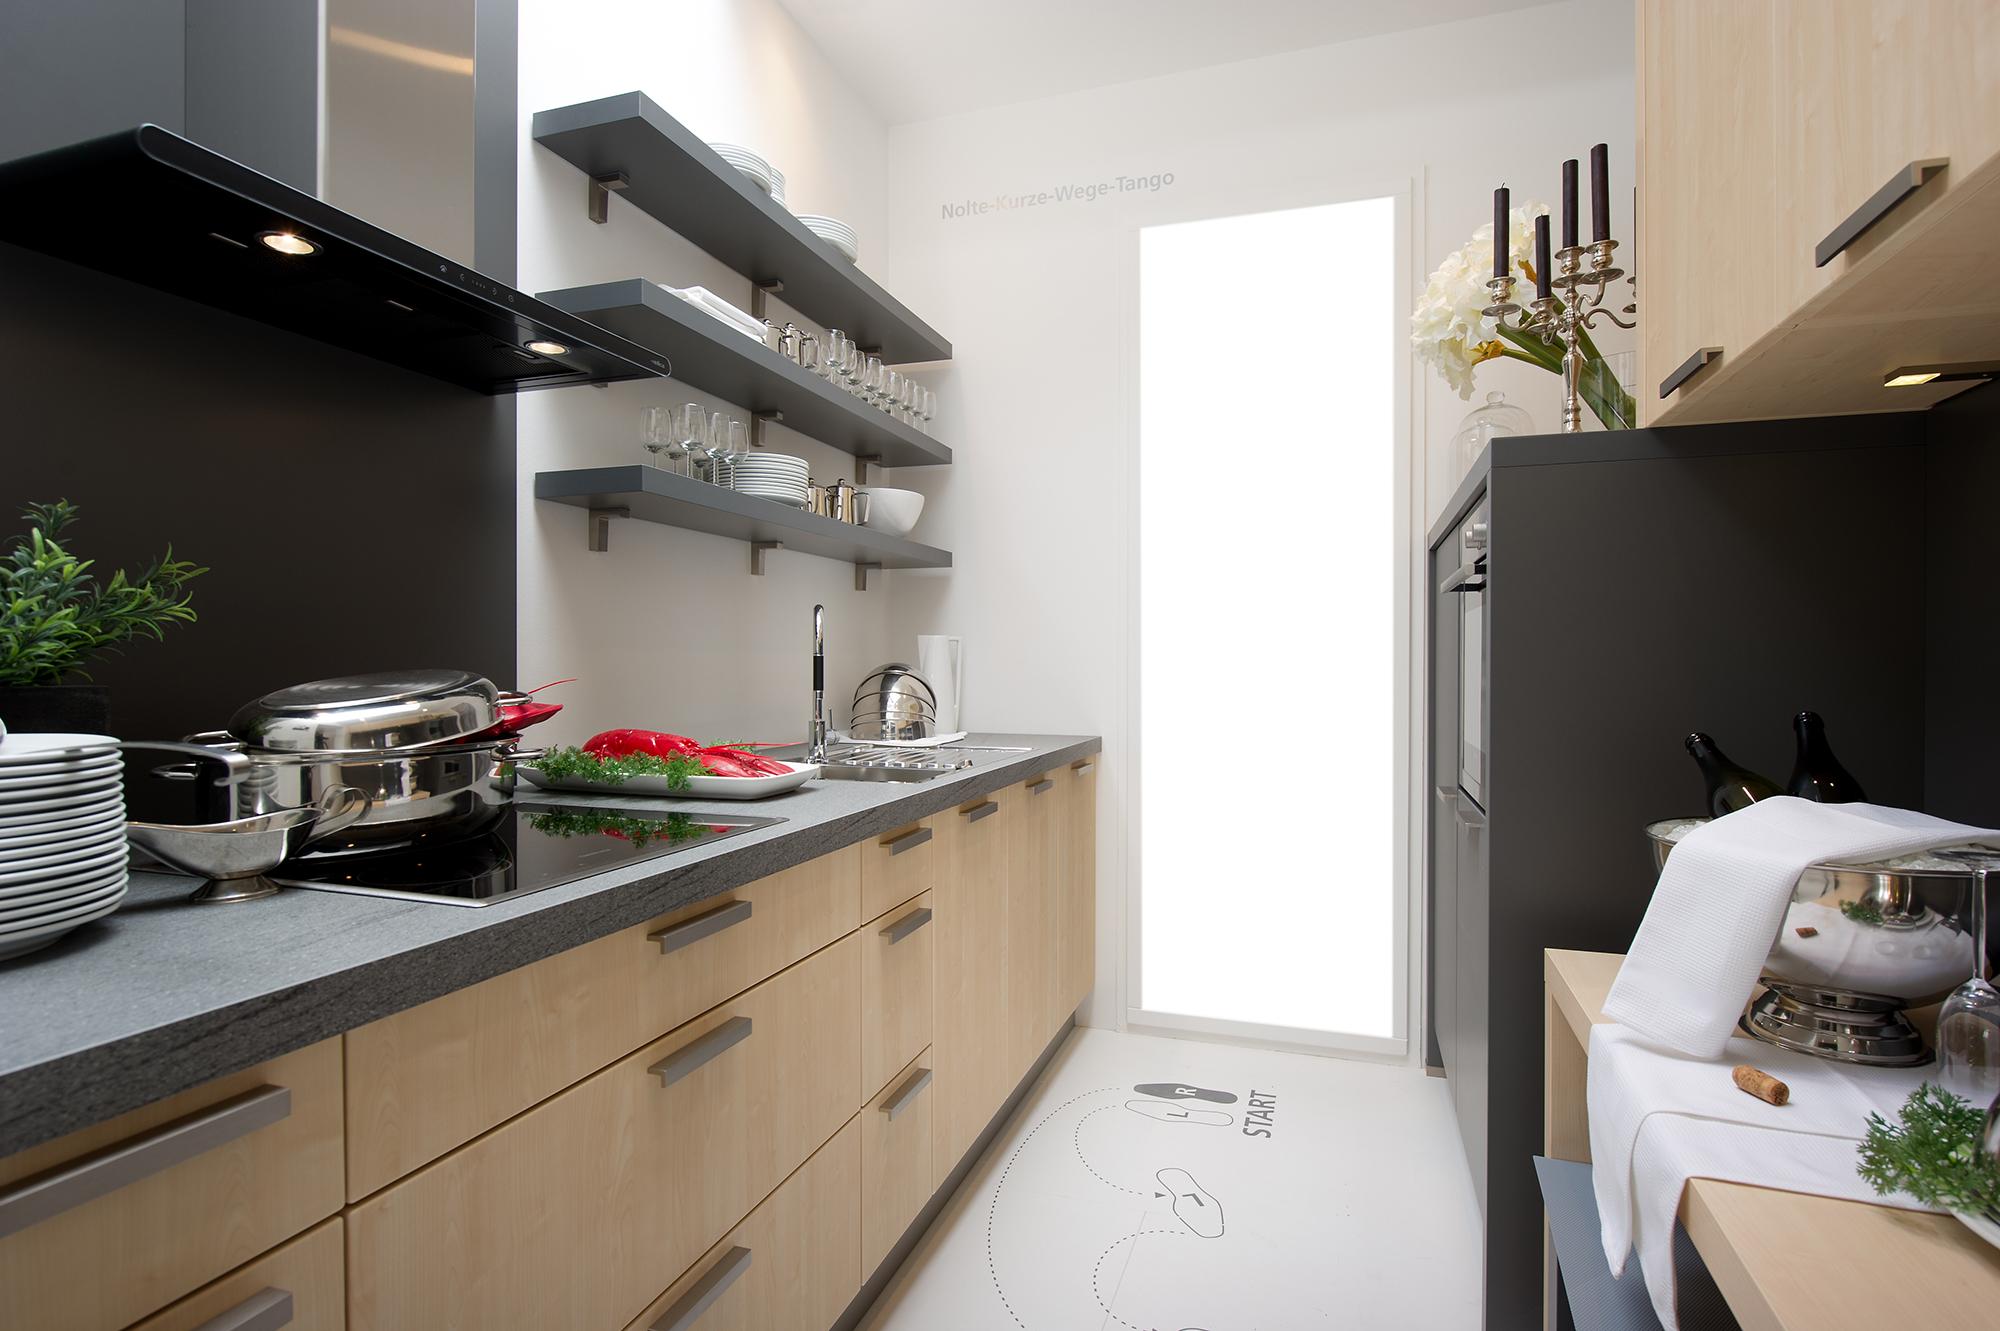 Бежево-серый гарнитур в узкой кухне